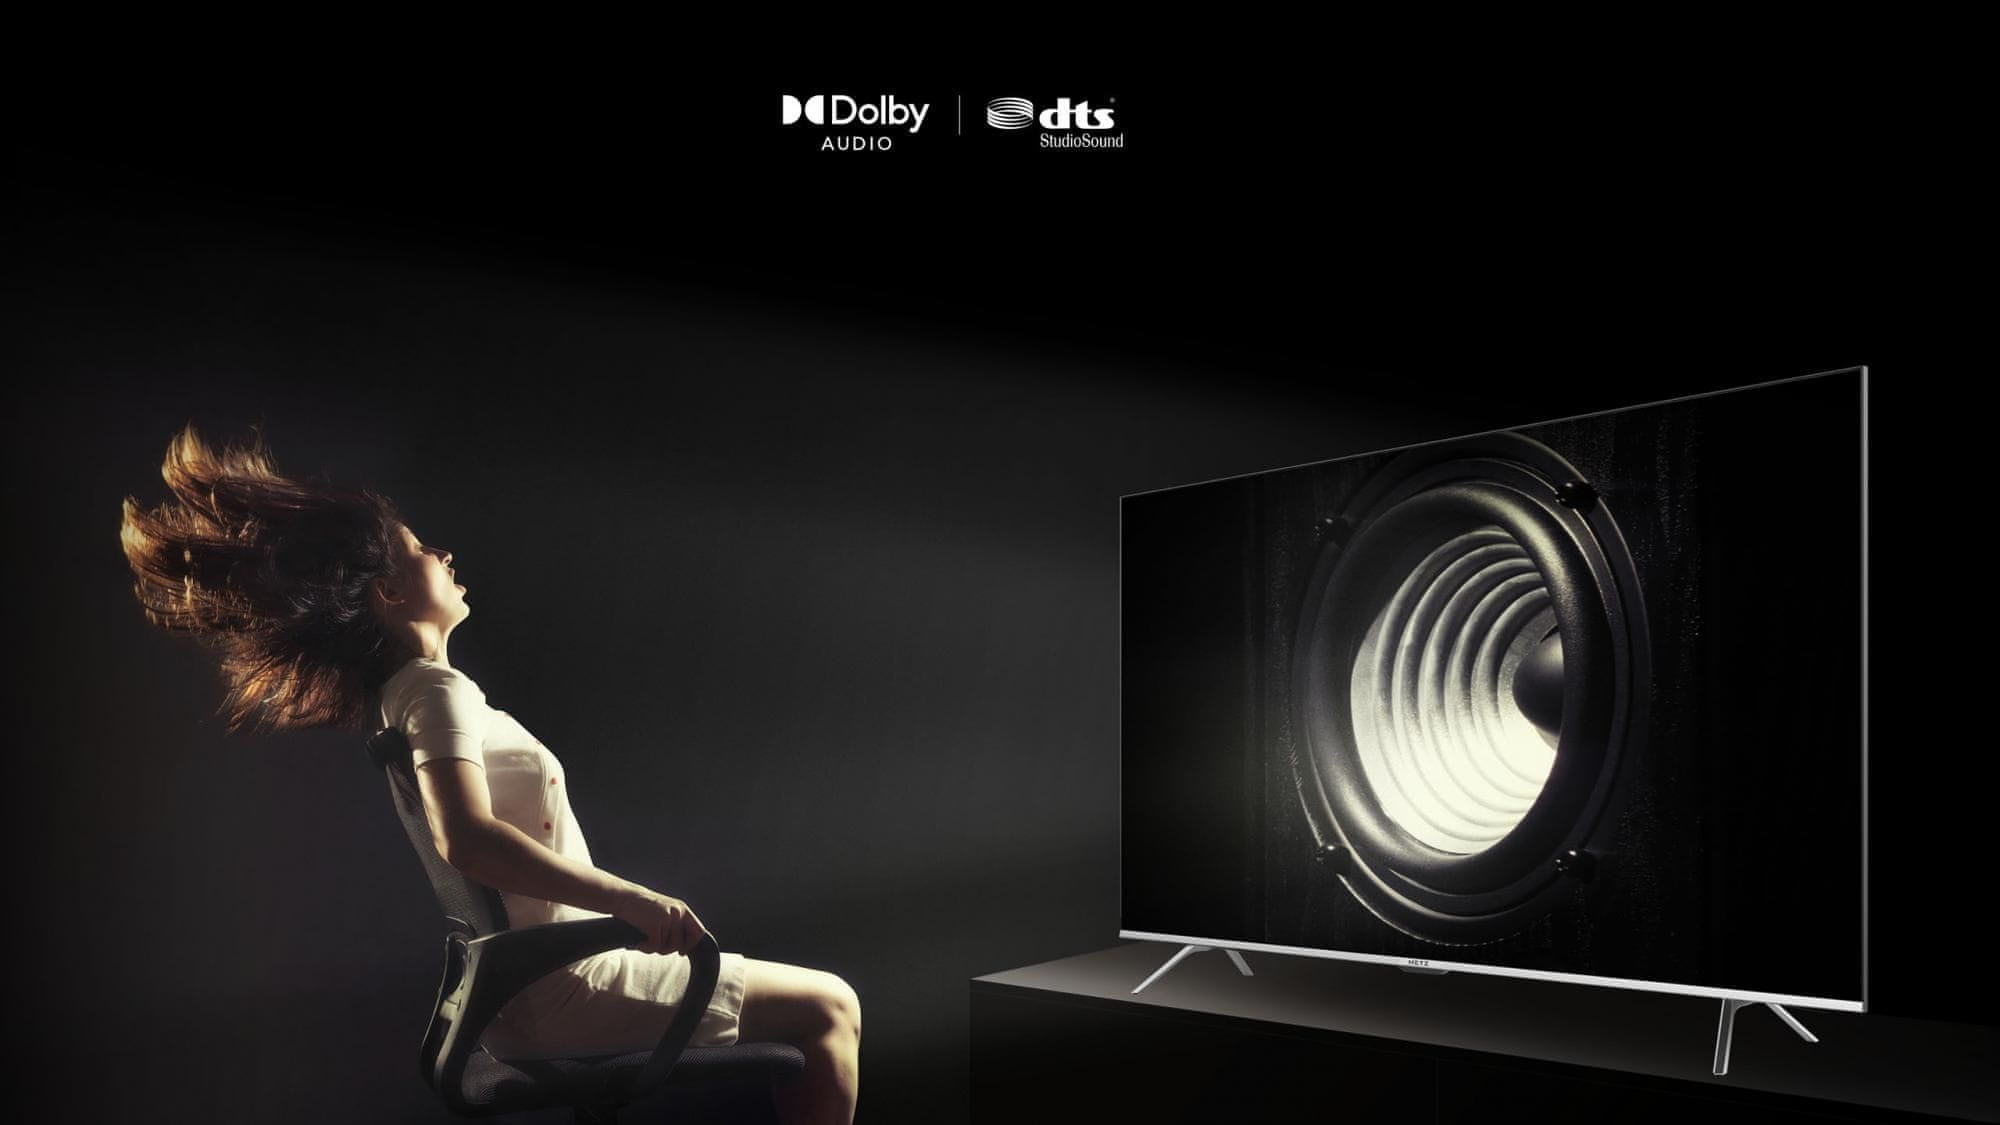 Metz UHD 4K smart tv televiízió dolby audio dts studiosound wonder audio 2021